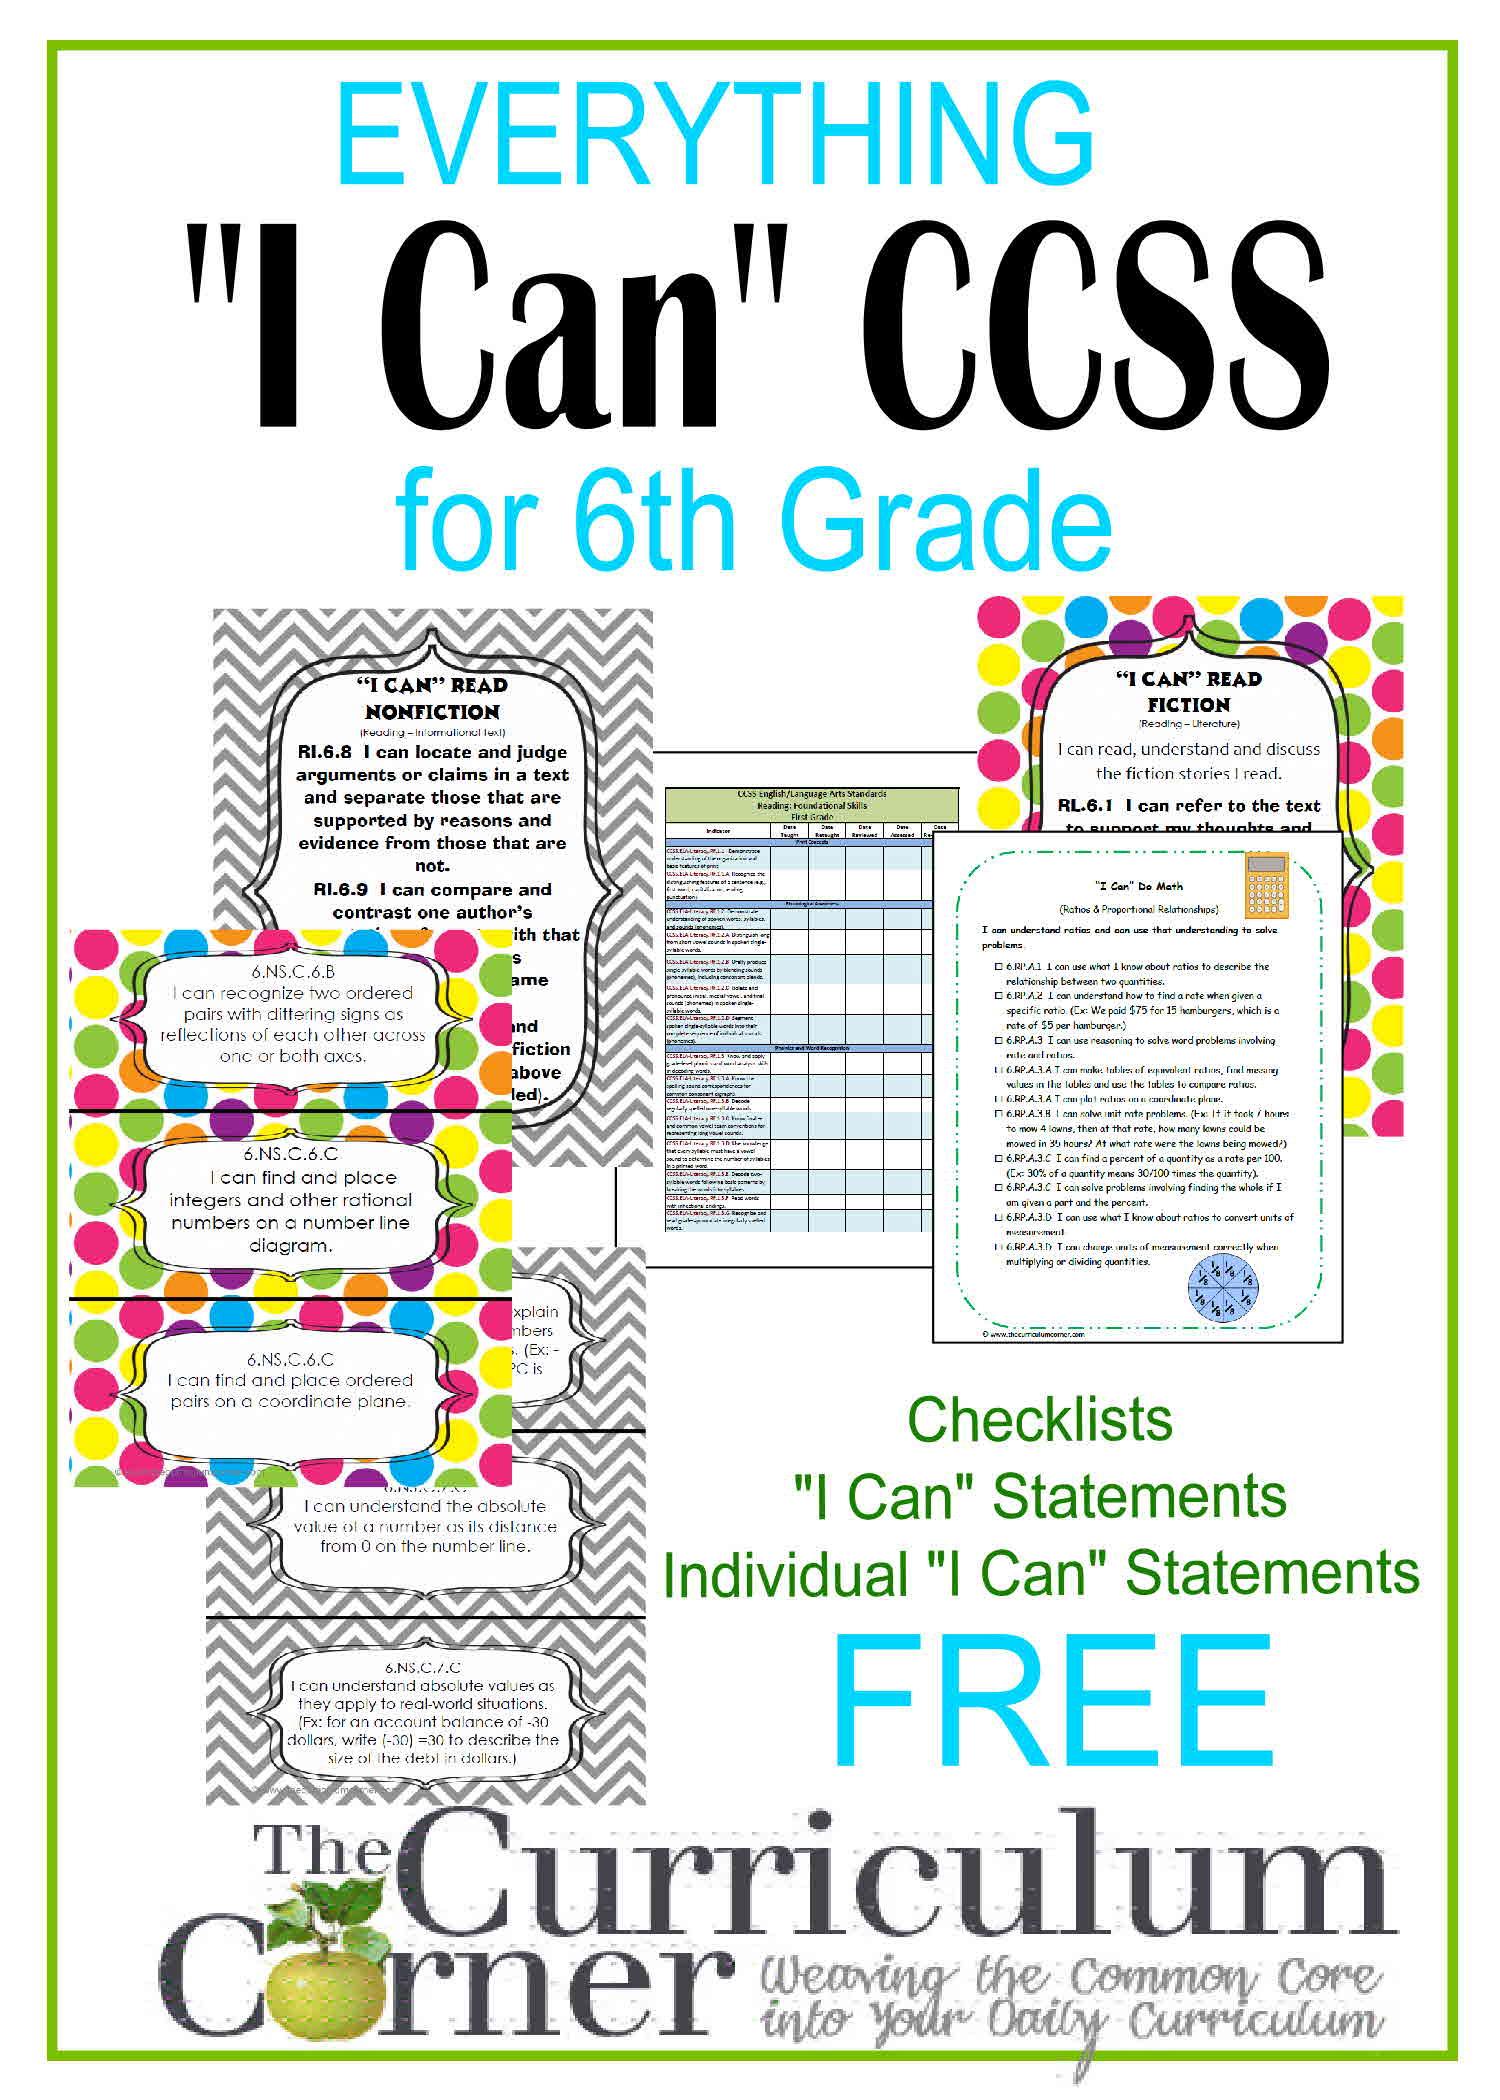 Free Common Core Clipart 20 Free Cliparts